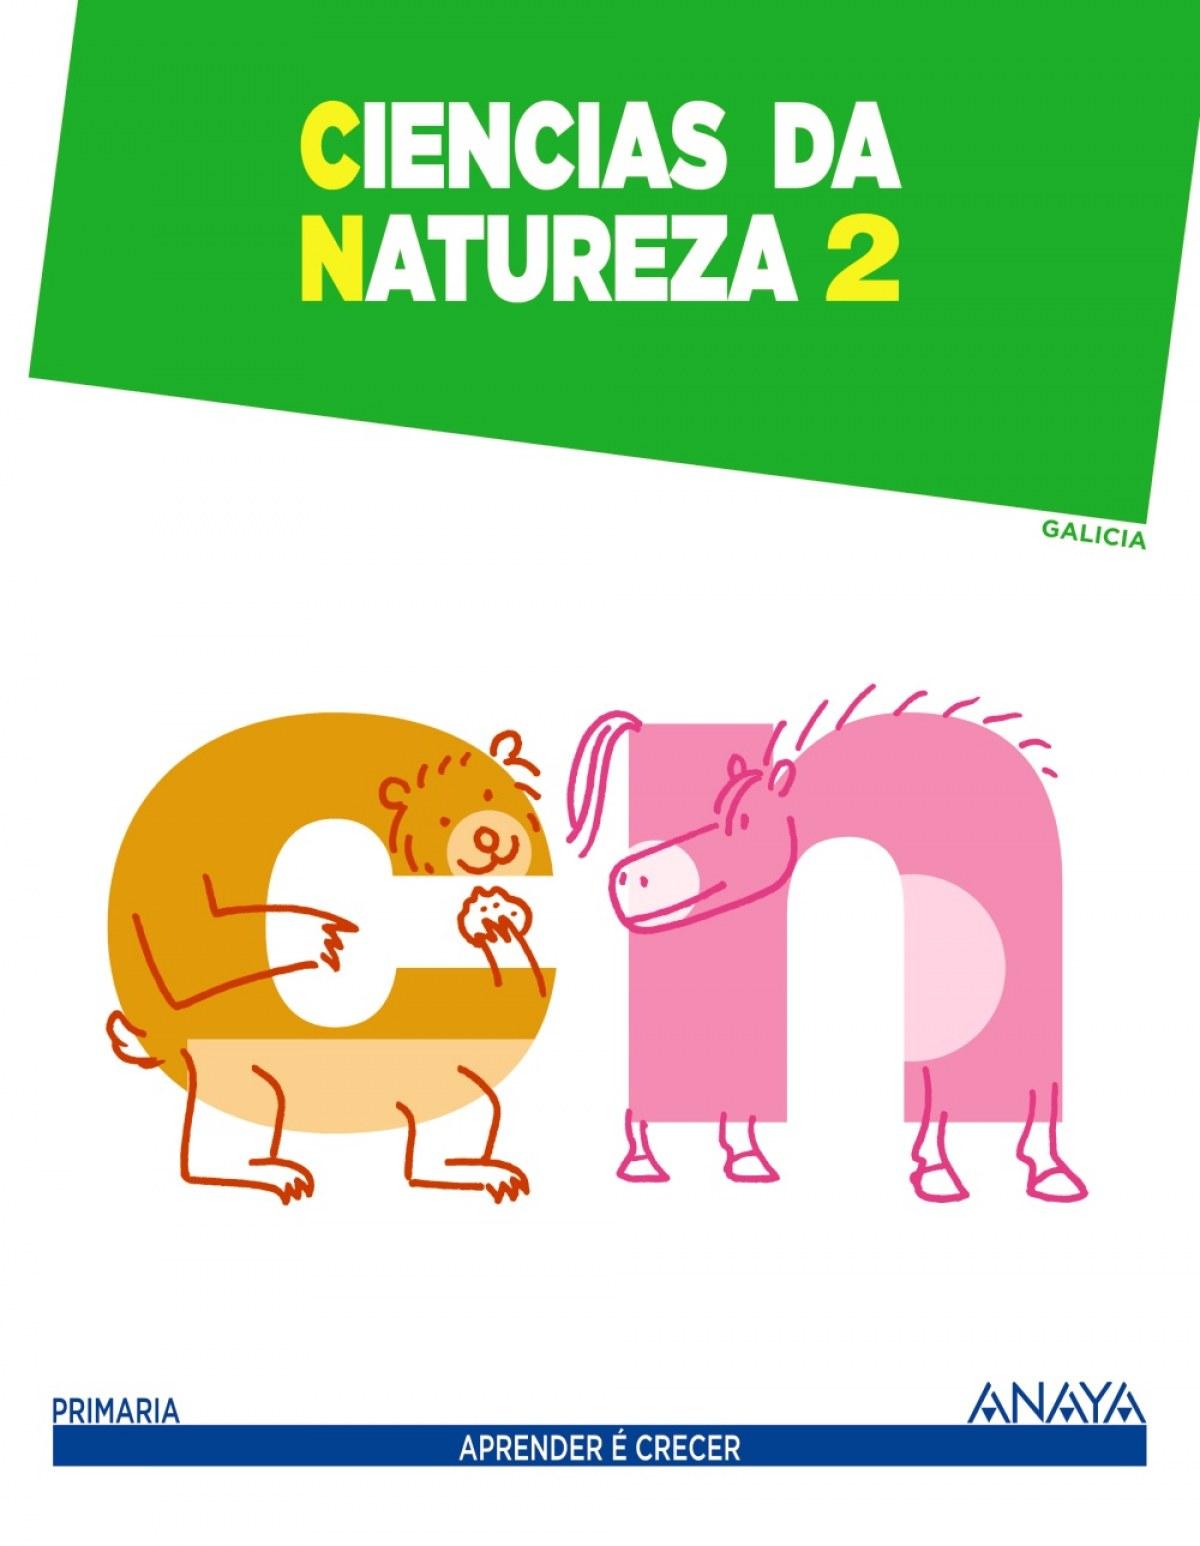 Ciencias da Natureza 2. - Pérez Madorrán, Emma/Marsá Lafarge, Martina/Díaz Santos, Cristina/Hidalgo del Cid, Otilia/Ferri Seba